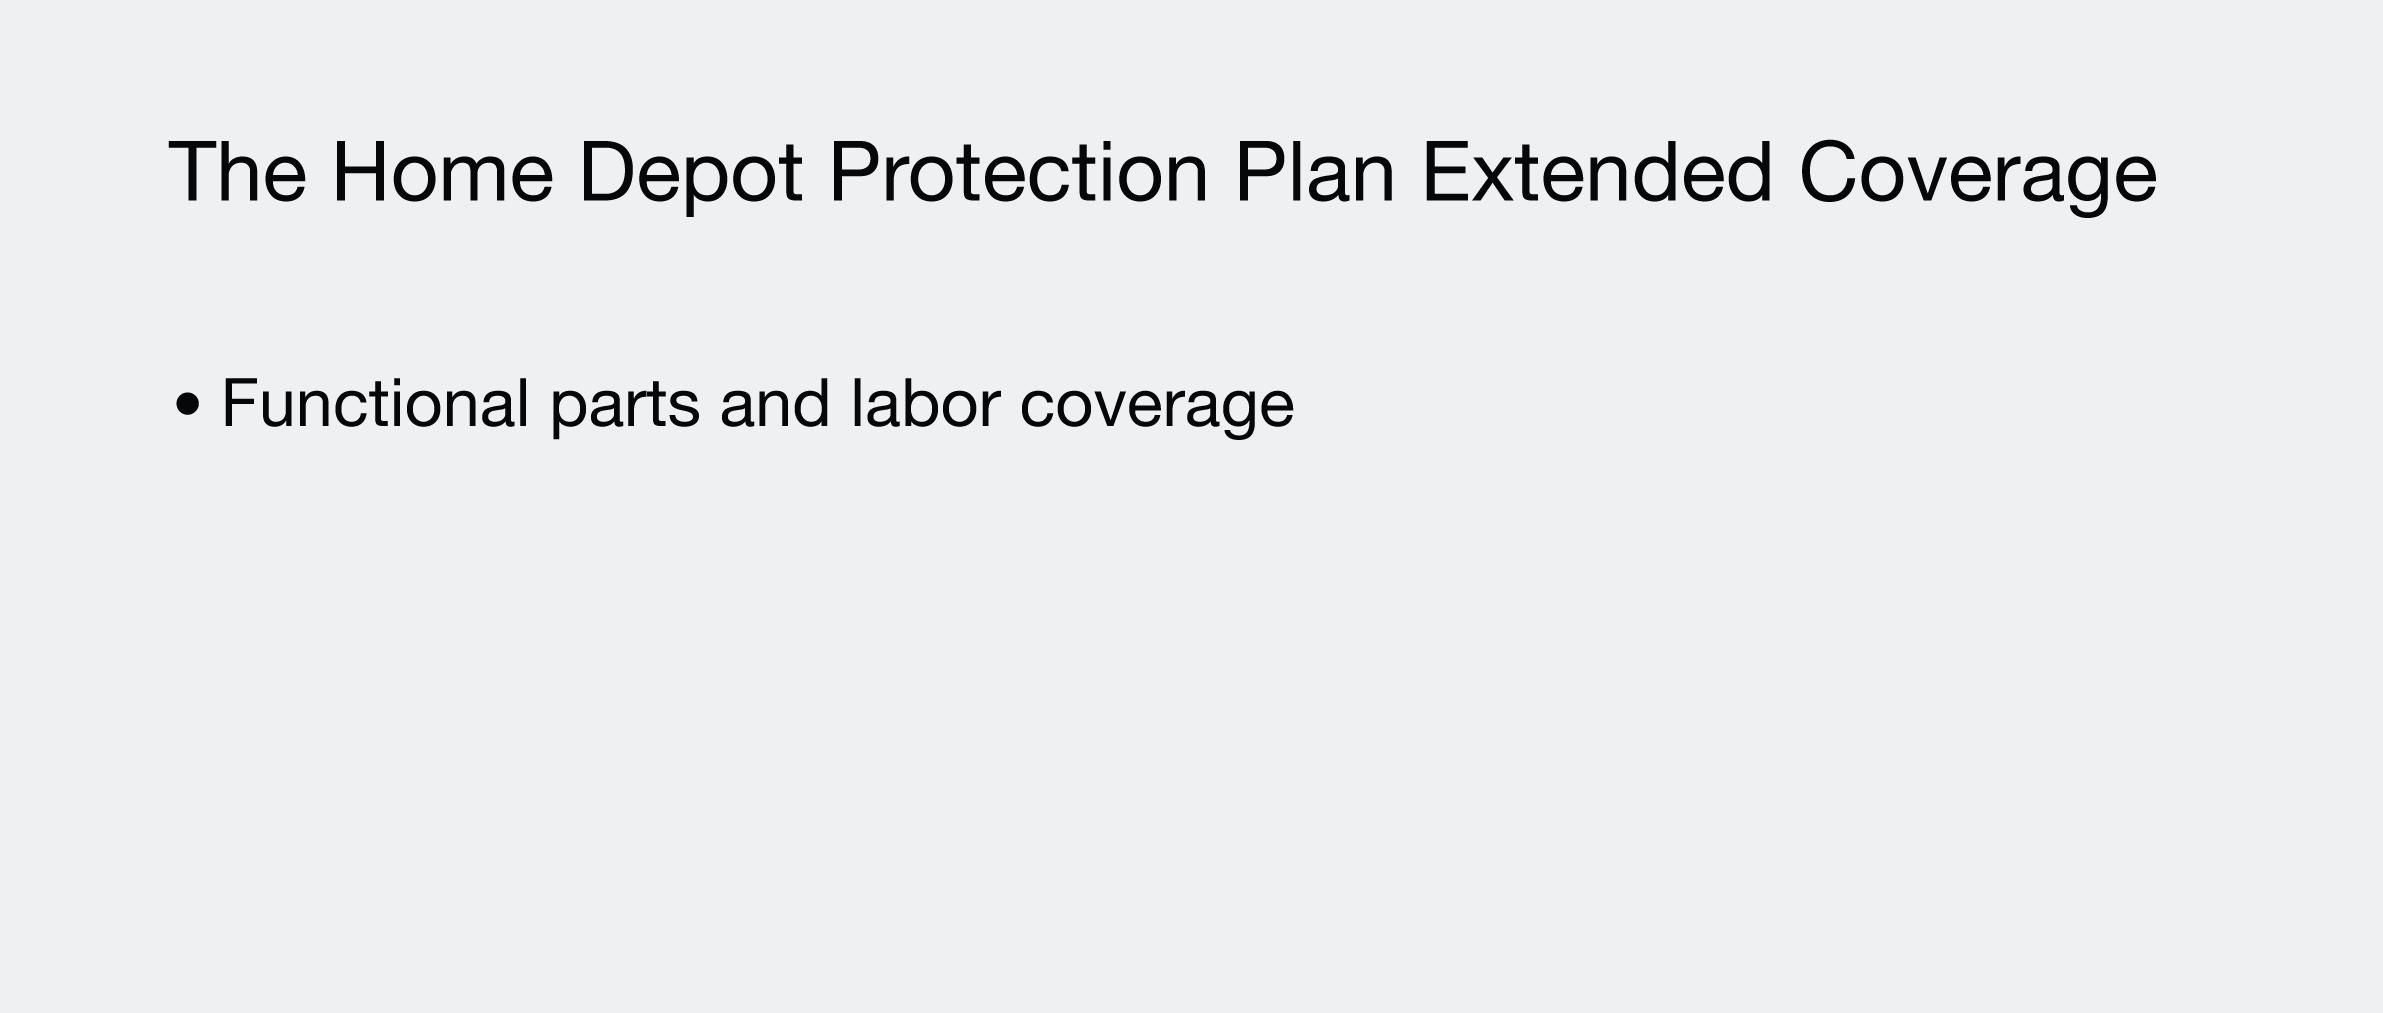 Manufacturer's warranty coverage